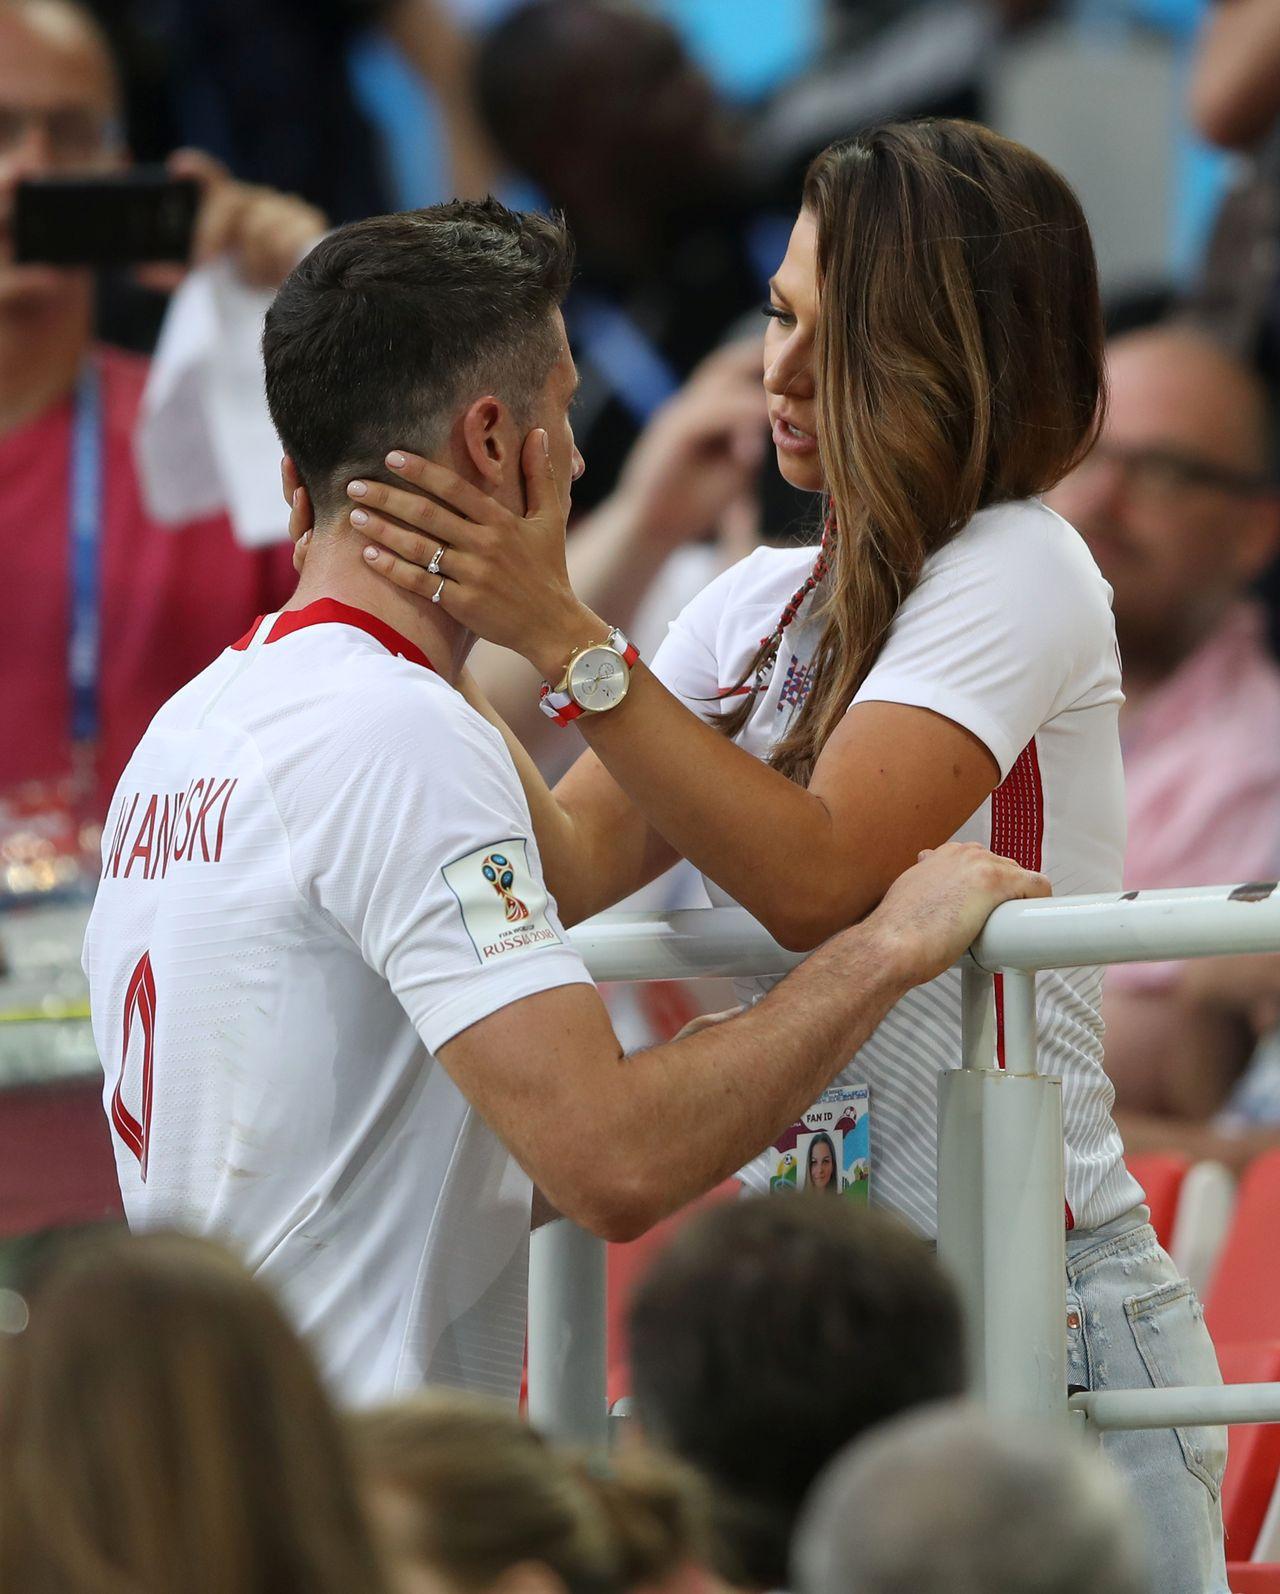 I po stresie - Lewandowska OPALONA na heban odreagowała Mundial